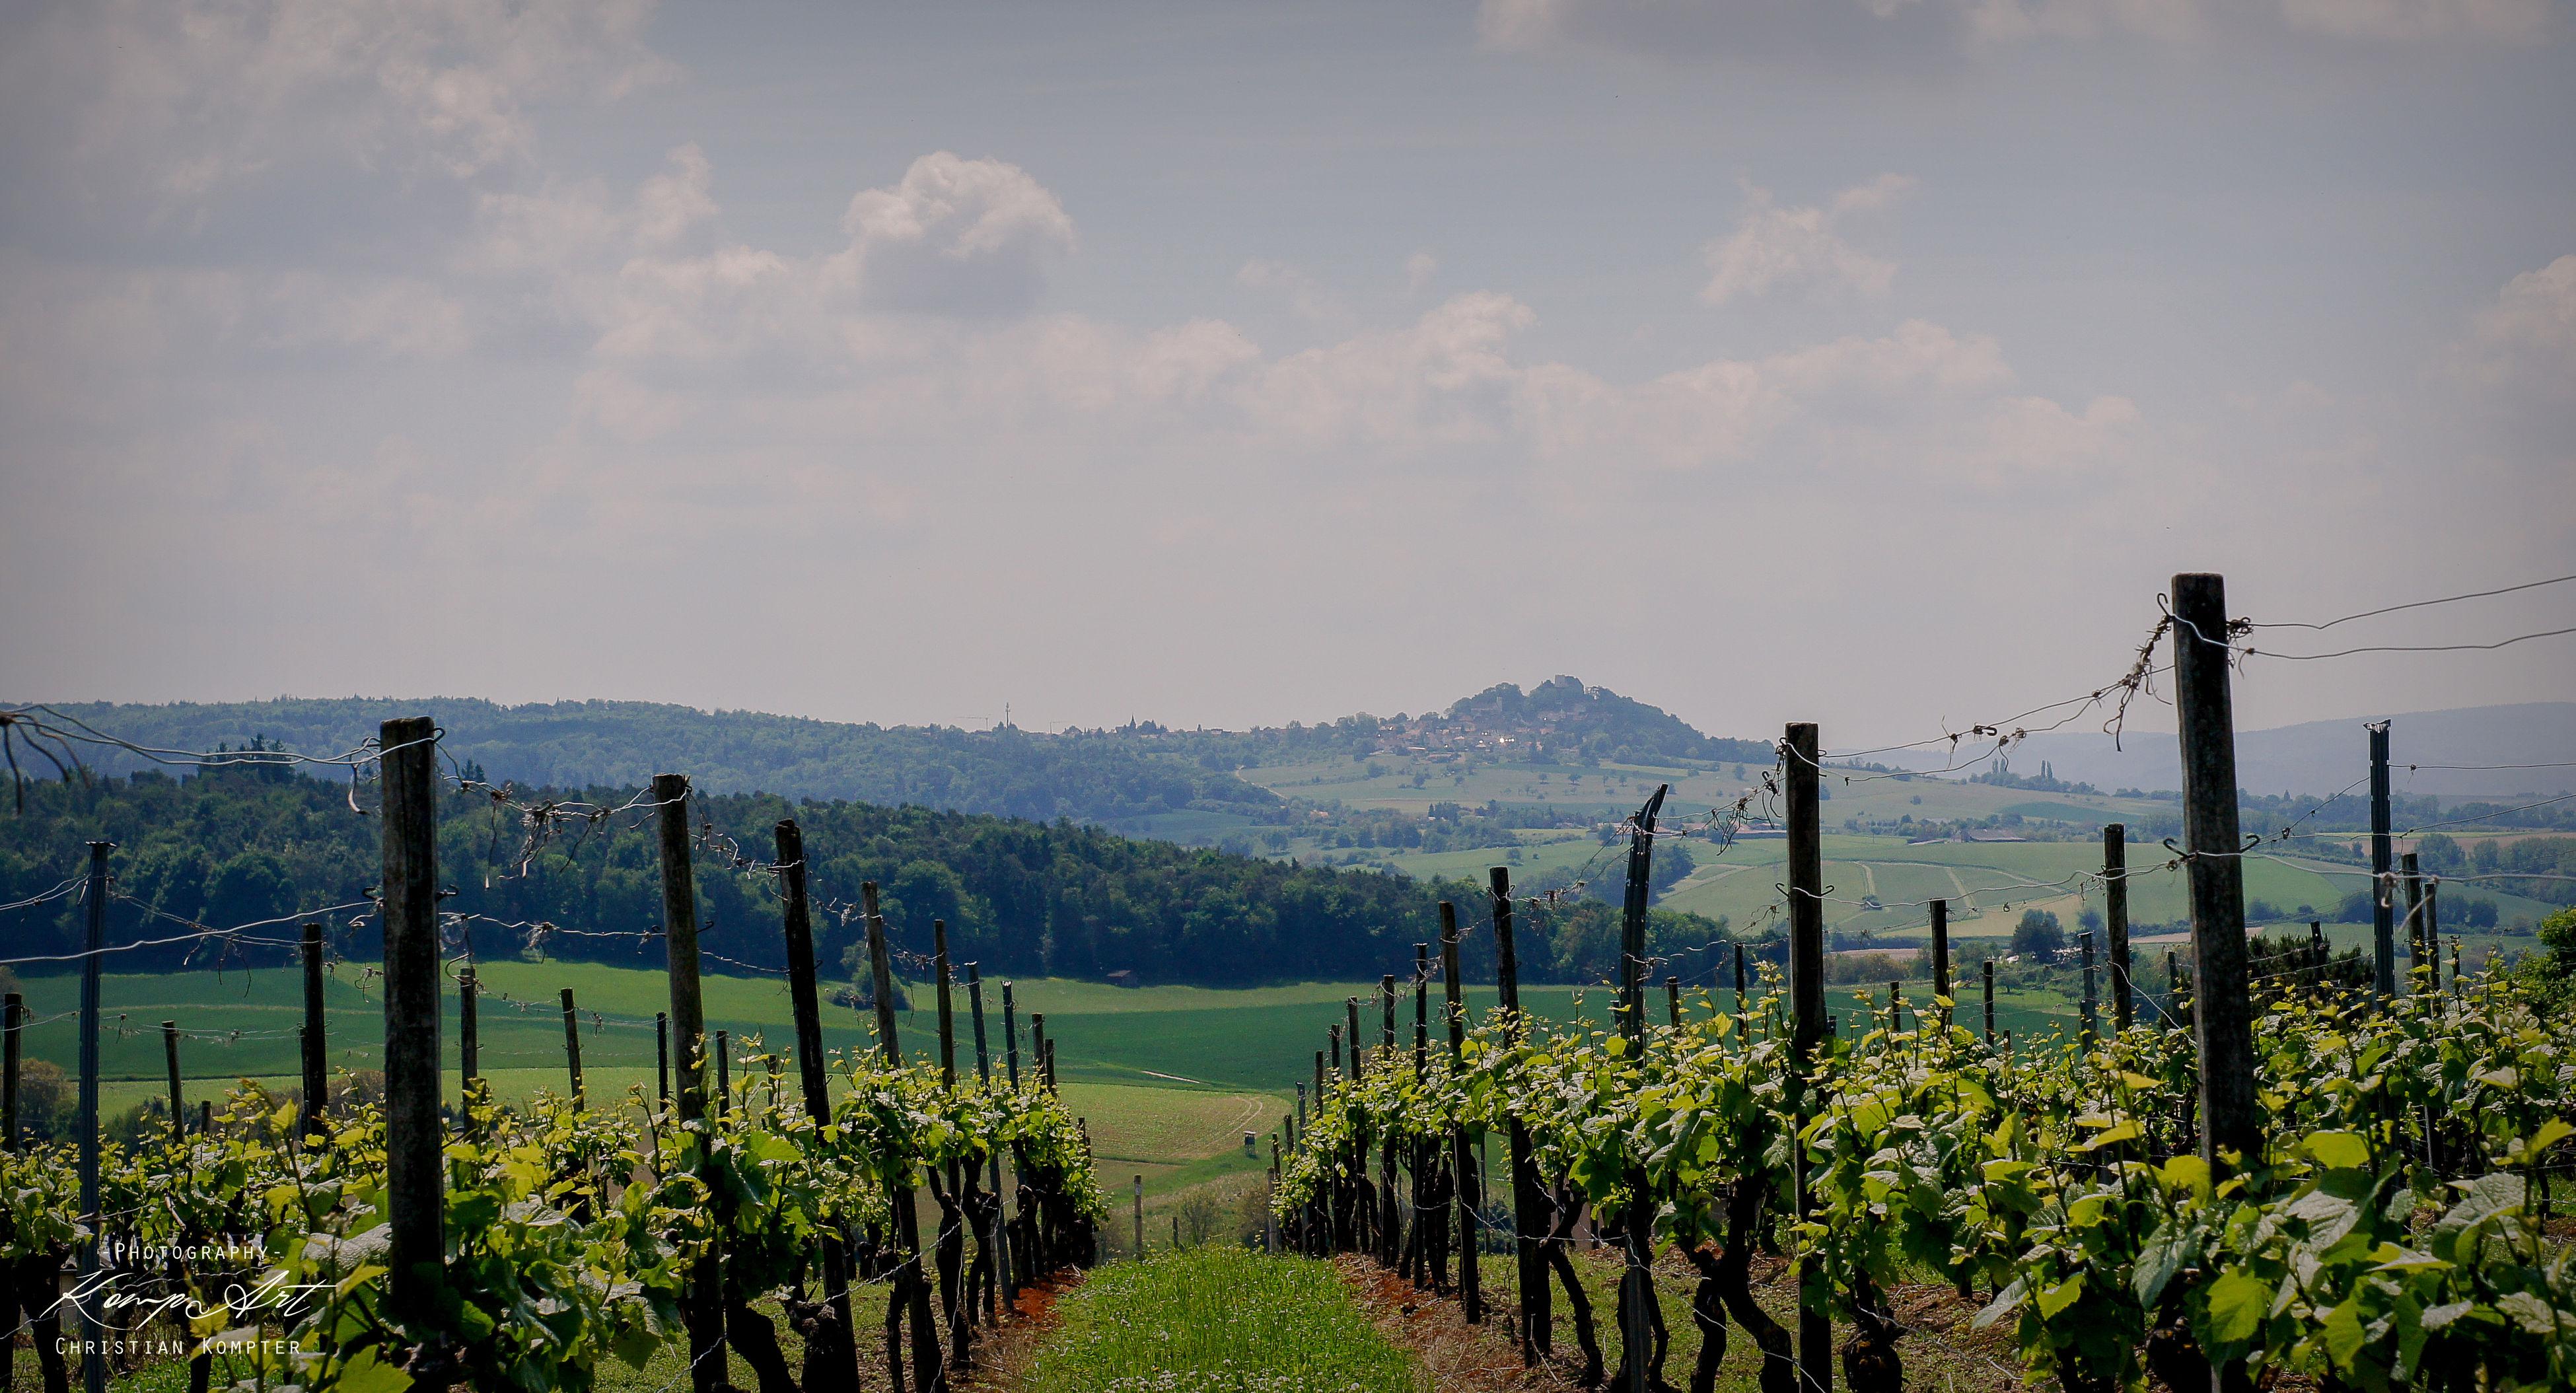 Veste Otzberg Sky Nature No People Outdoors Beauty In Nature Day Nature GERMANY🇩🇪DEUTSCHERLAND@ Wine Rack Winecountry View Burg Green Color Sony Alpha 77 M2 Minolta 50mmf 1,7